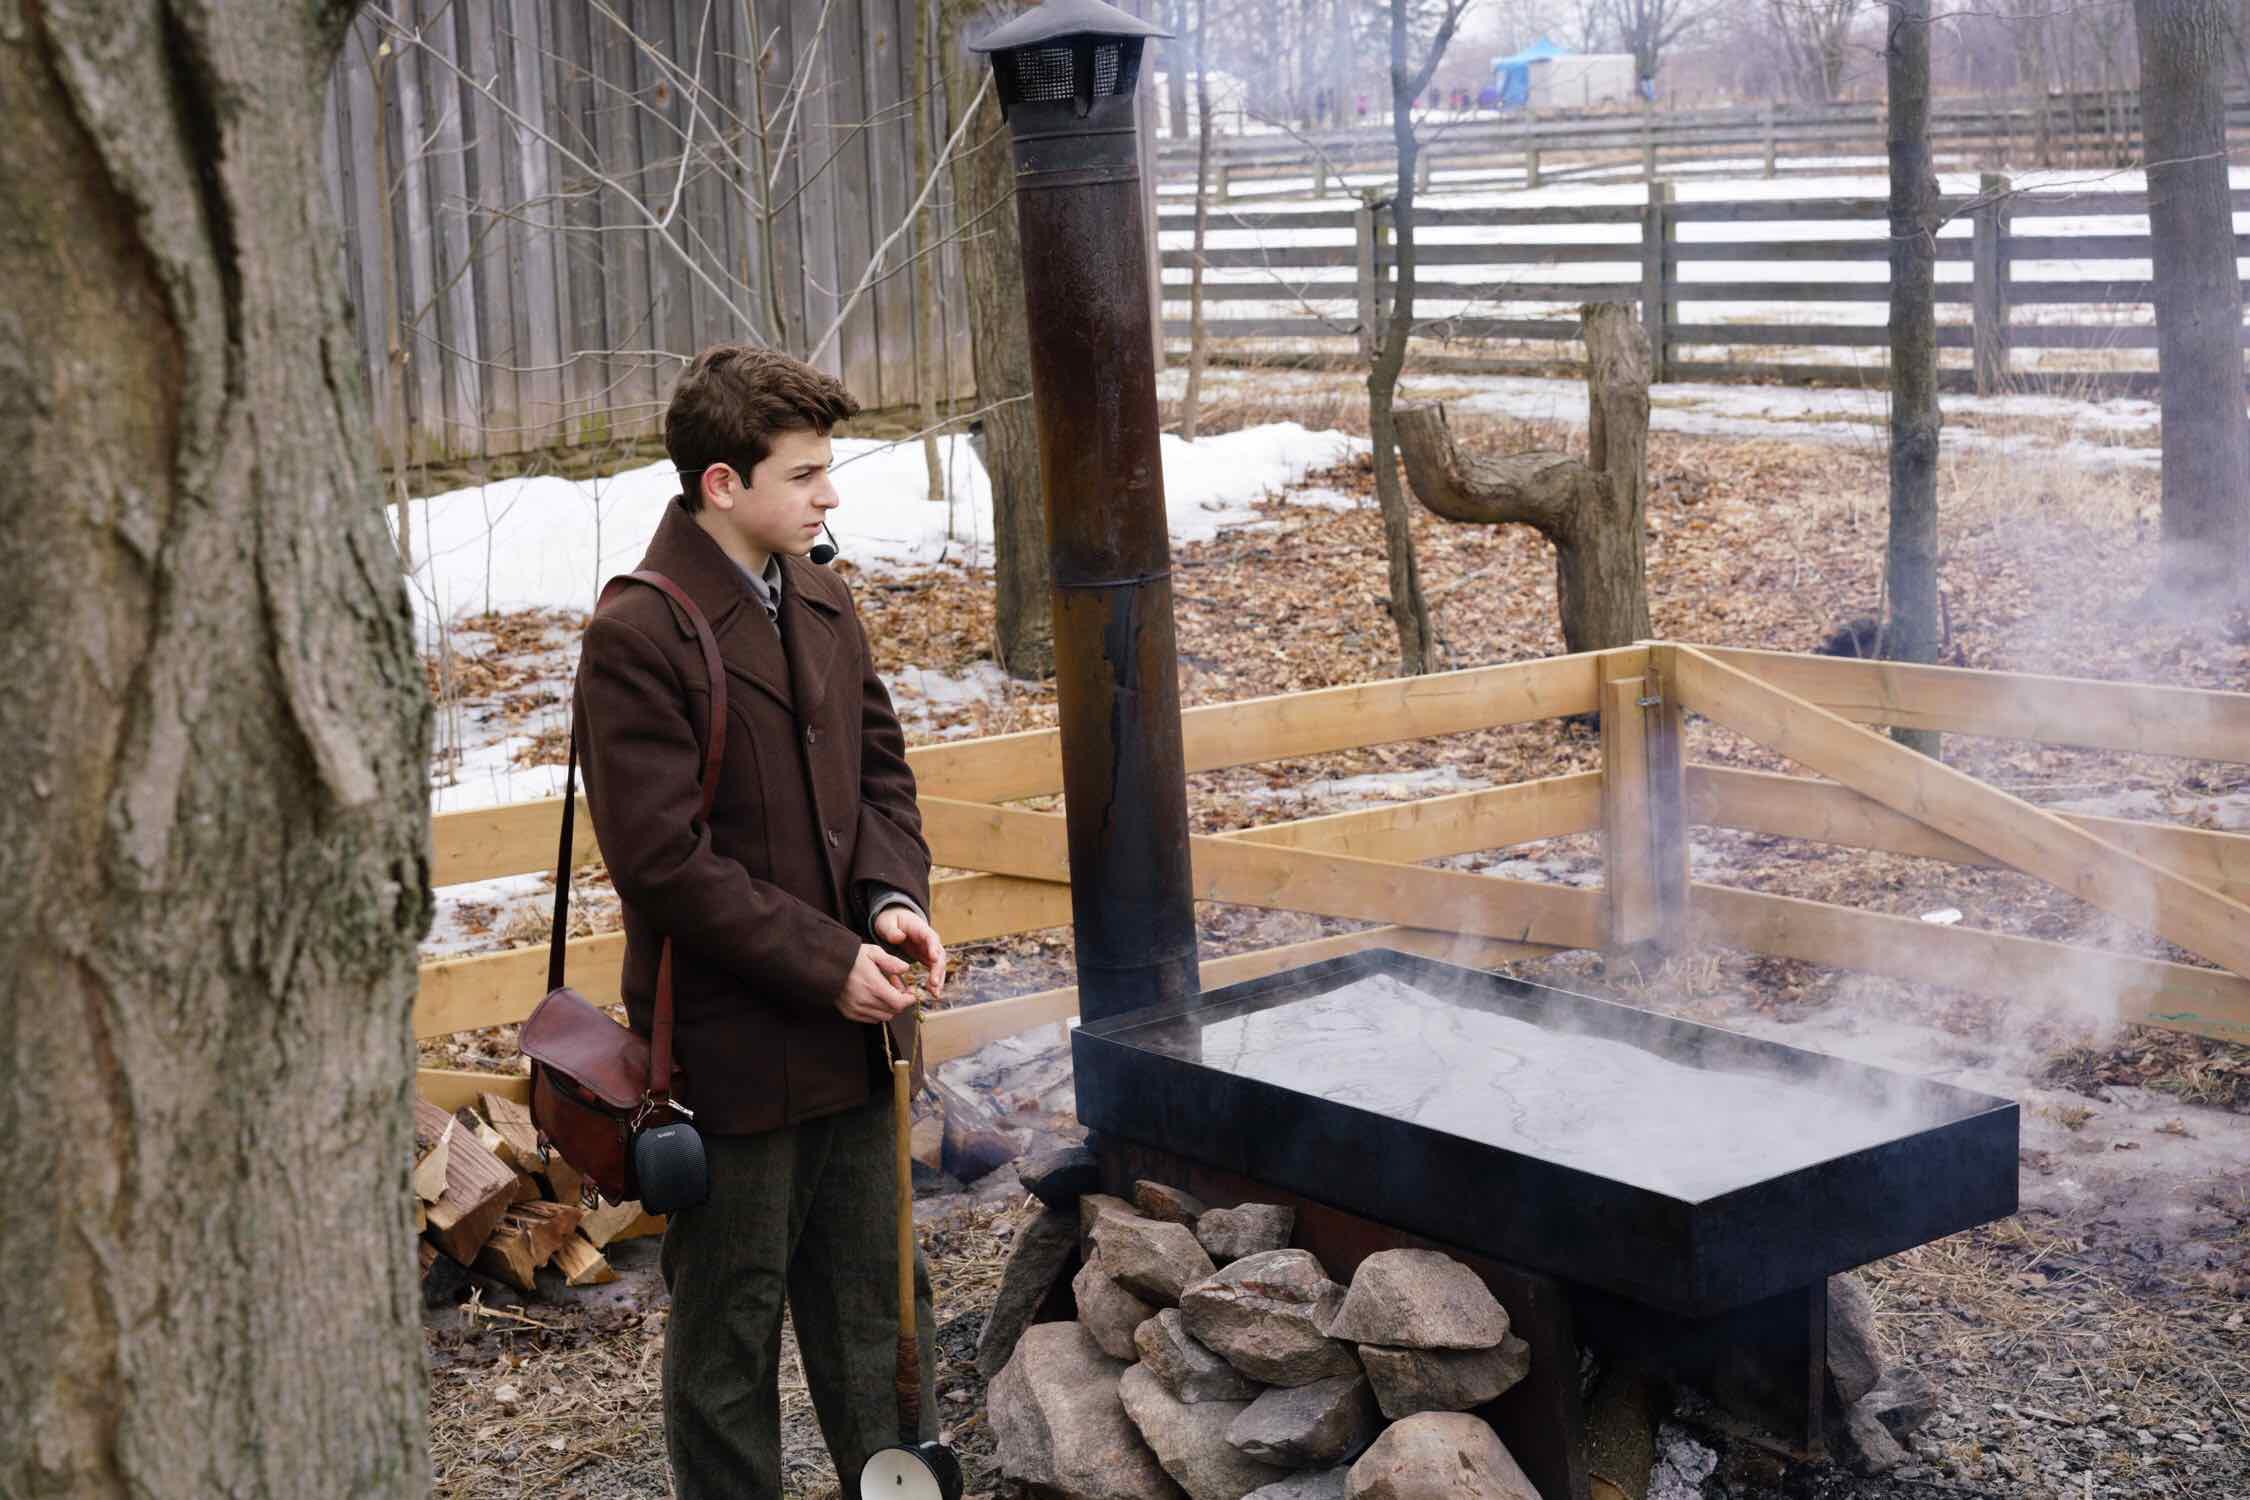 Maple syrup evaporator (100 years ago)